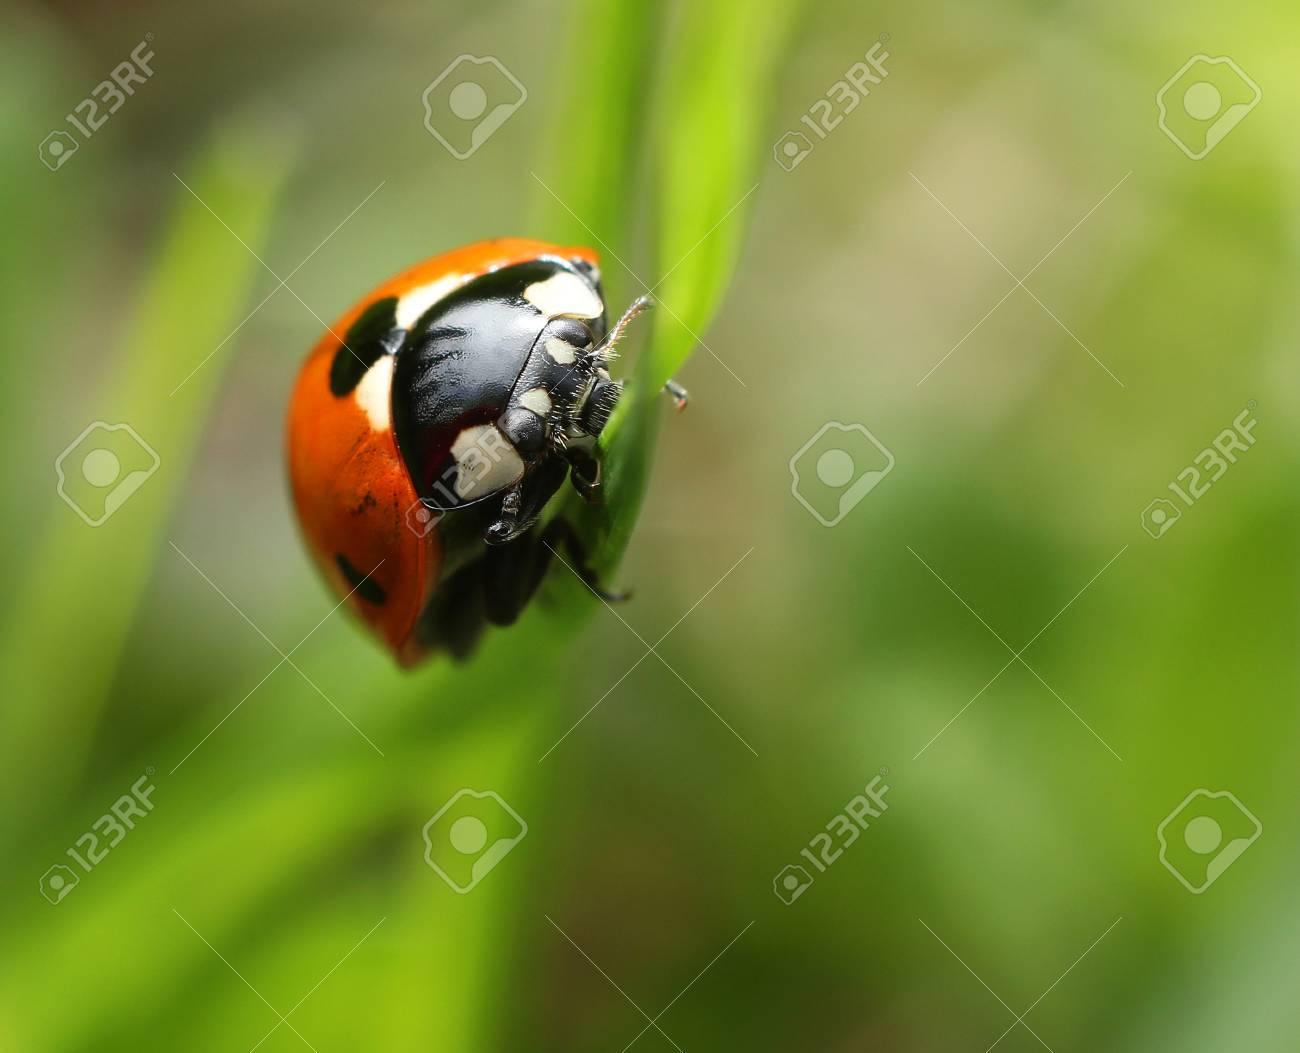 Labybug Climbing On Green Grass Blade Closeup Macro Stock Photo